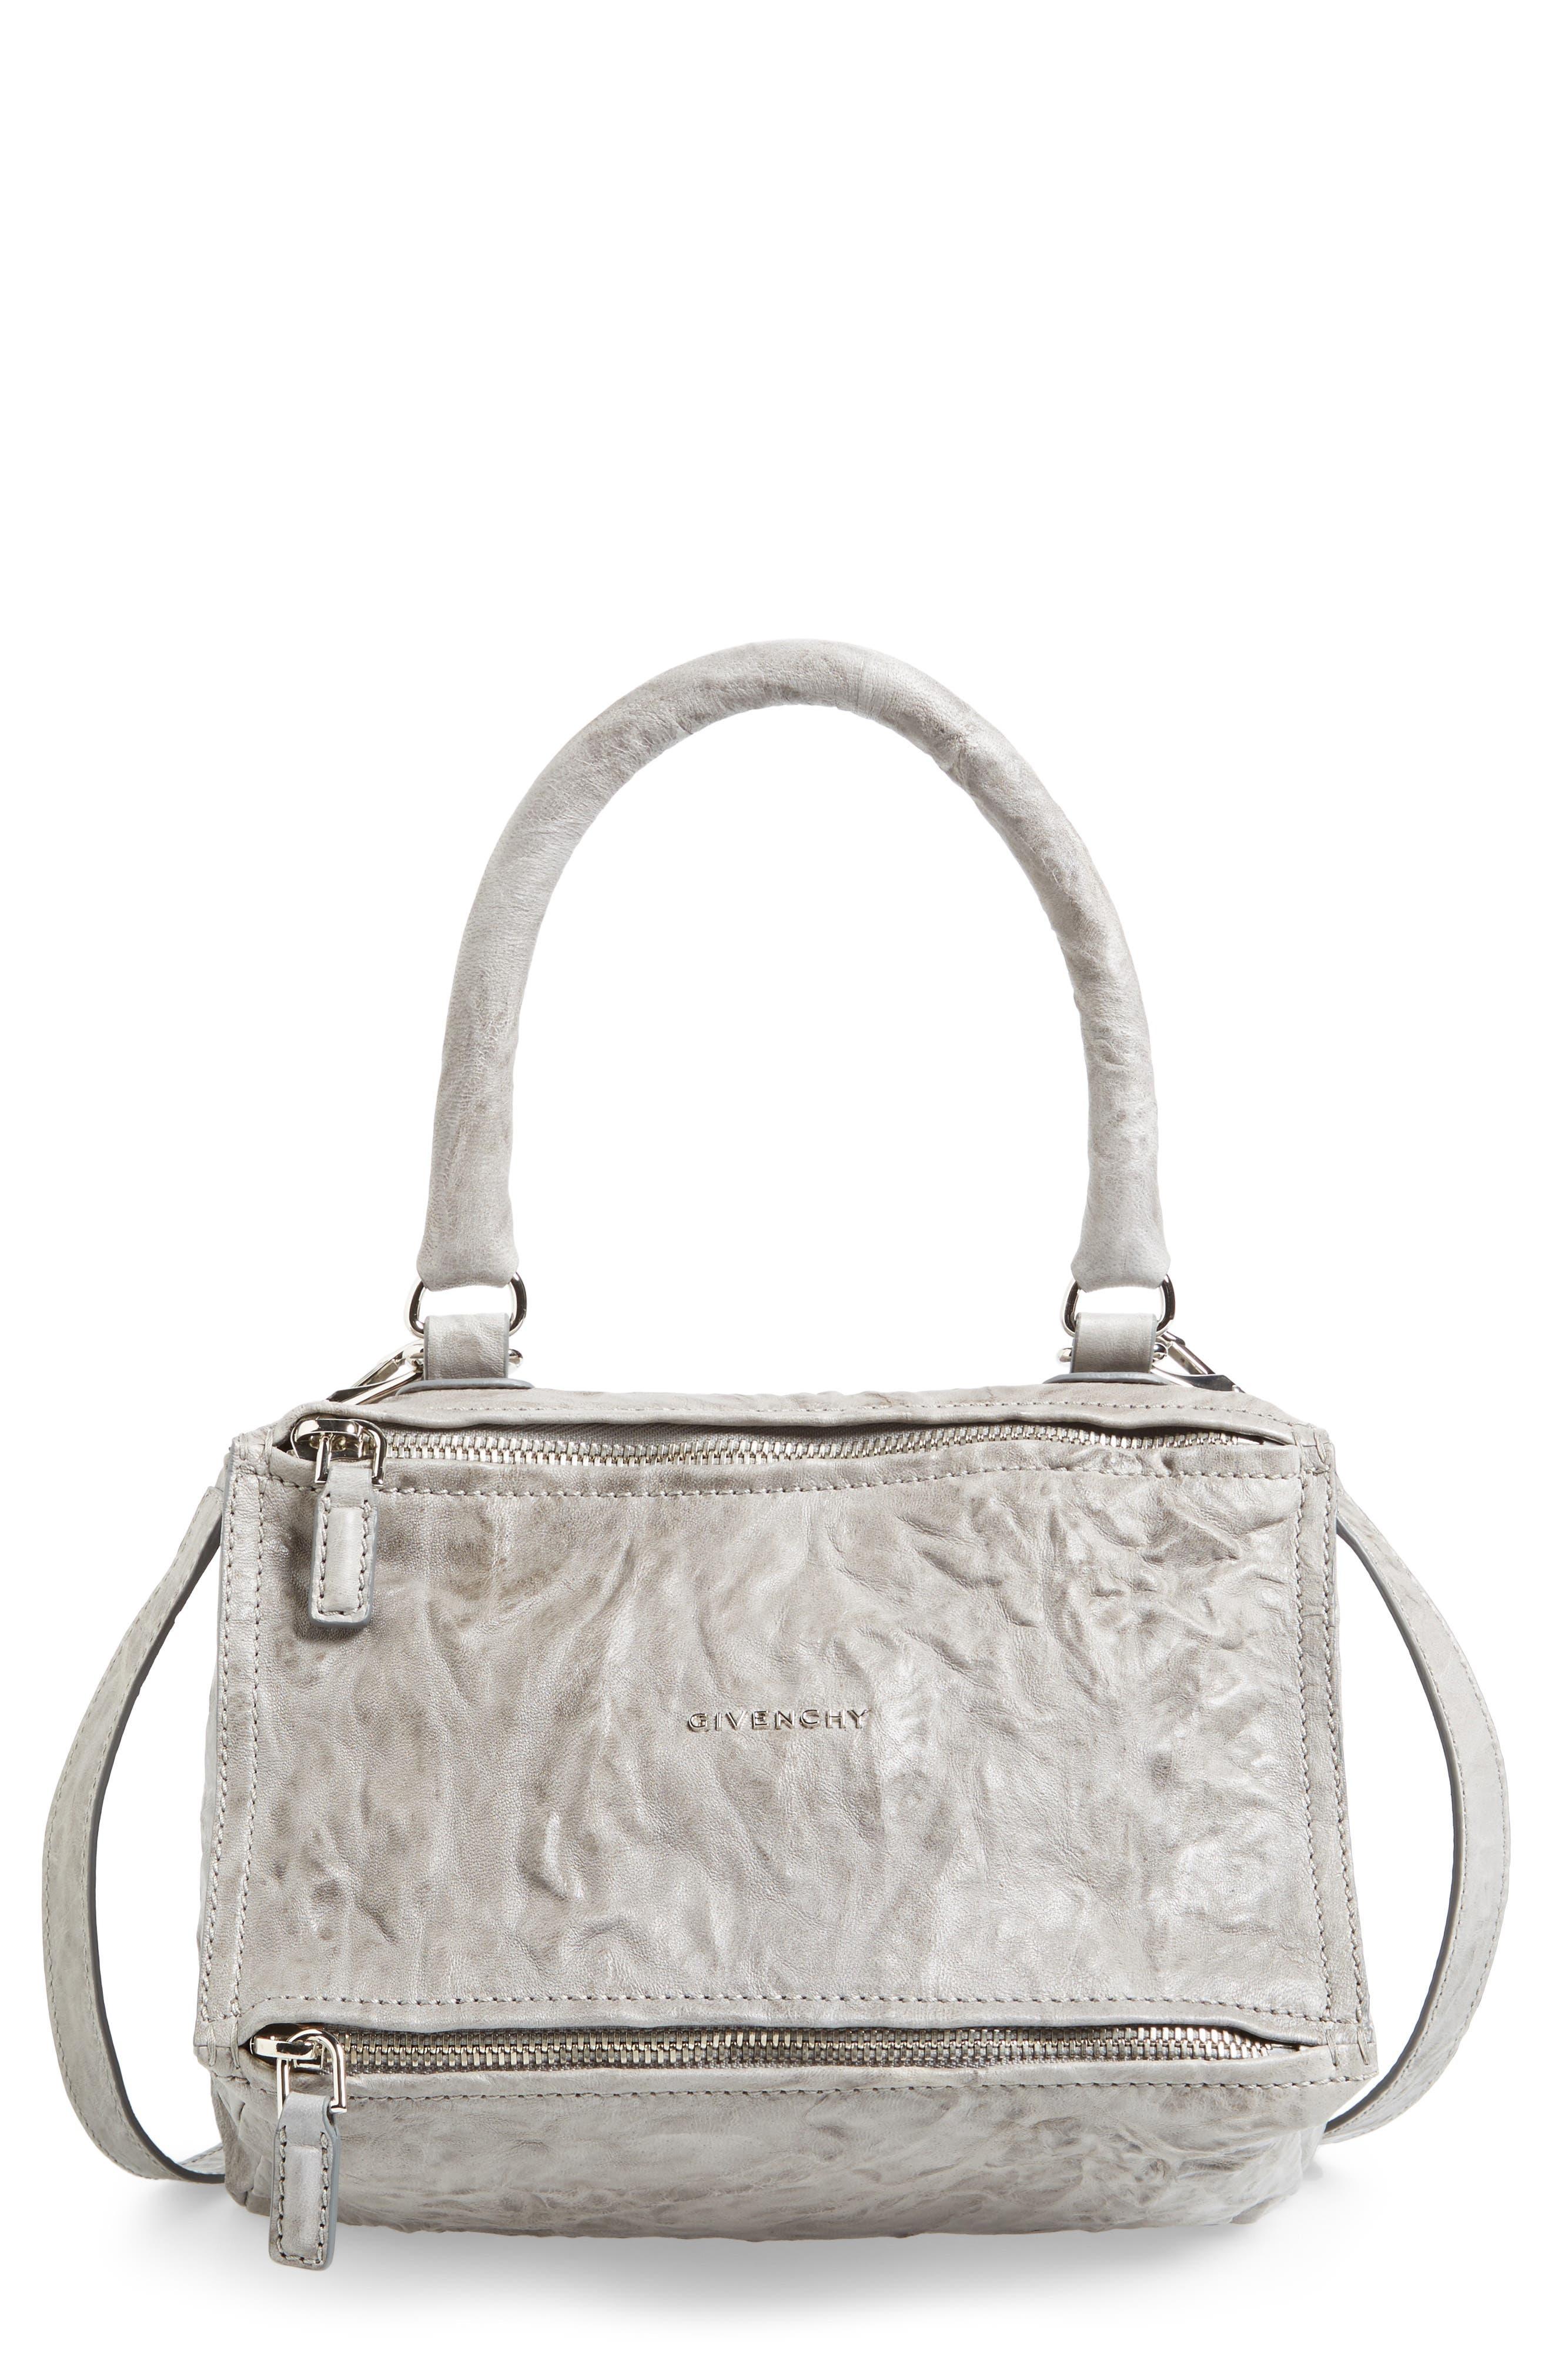 Alternate Image 1 Selected - Givenchy 'Small Pepe Pandora' Leather Shoulder Bag